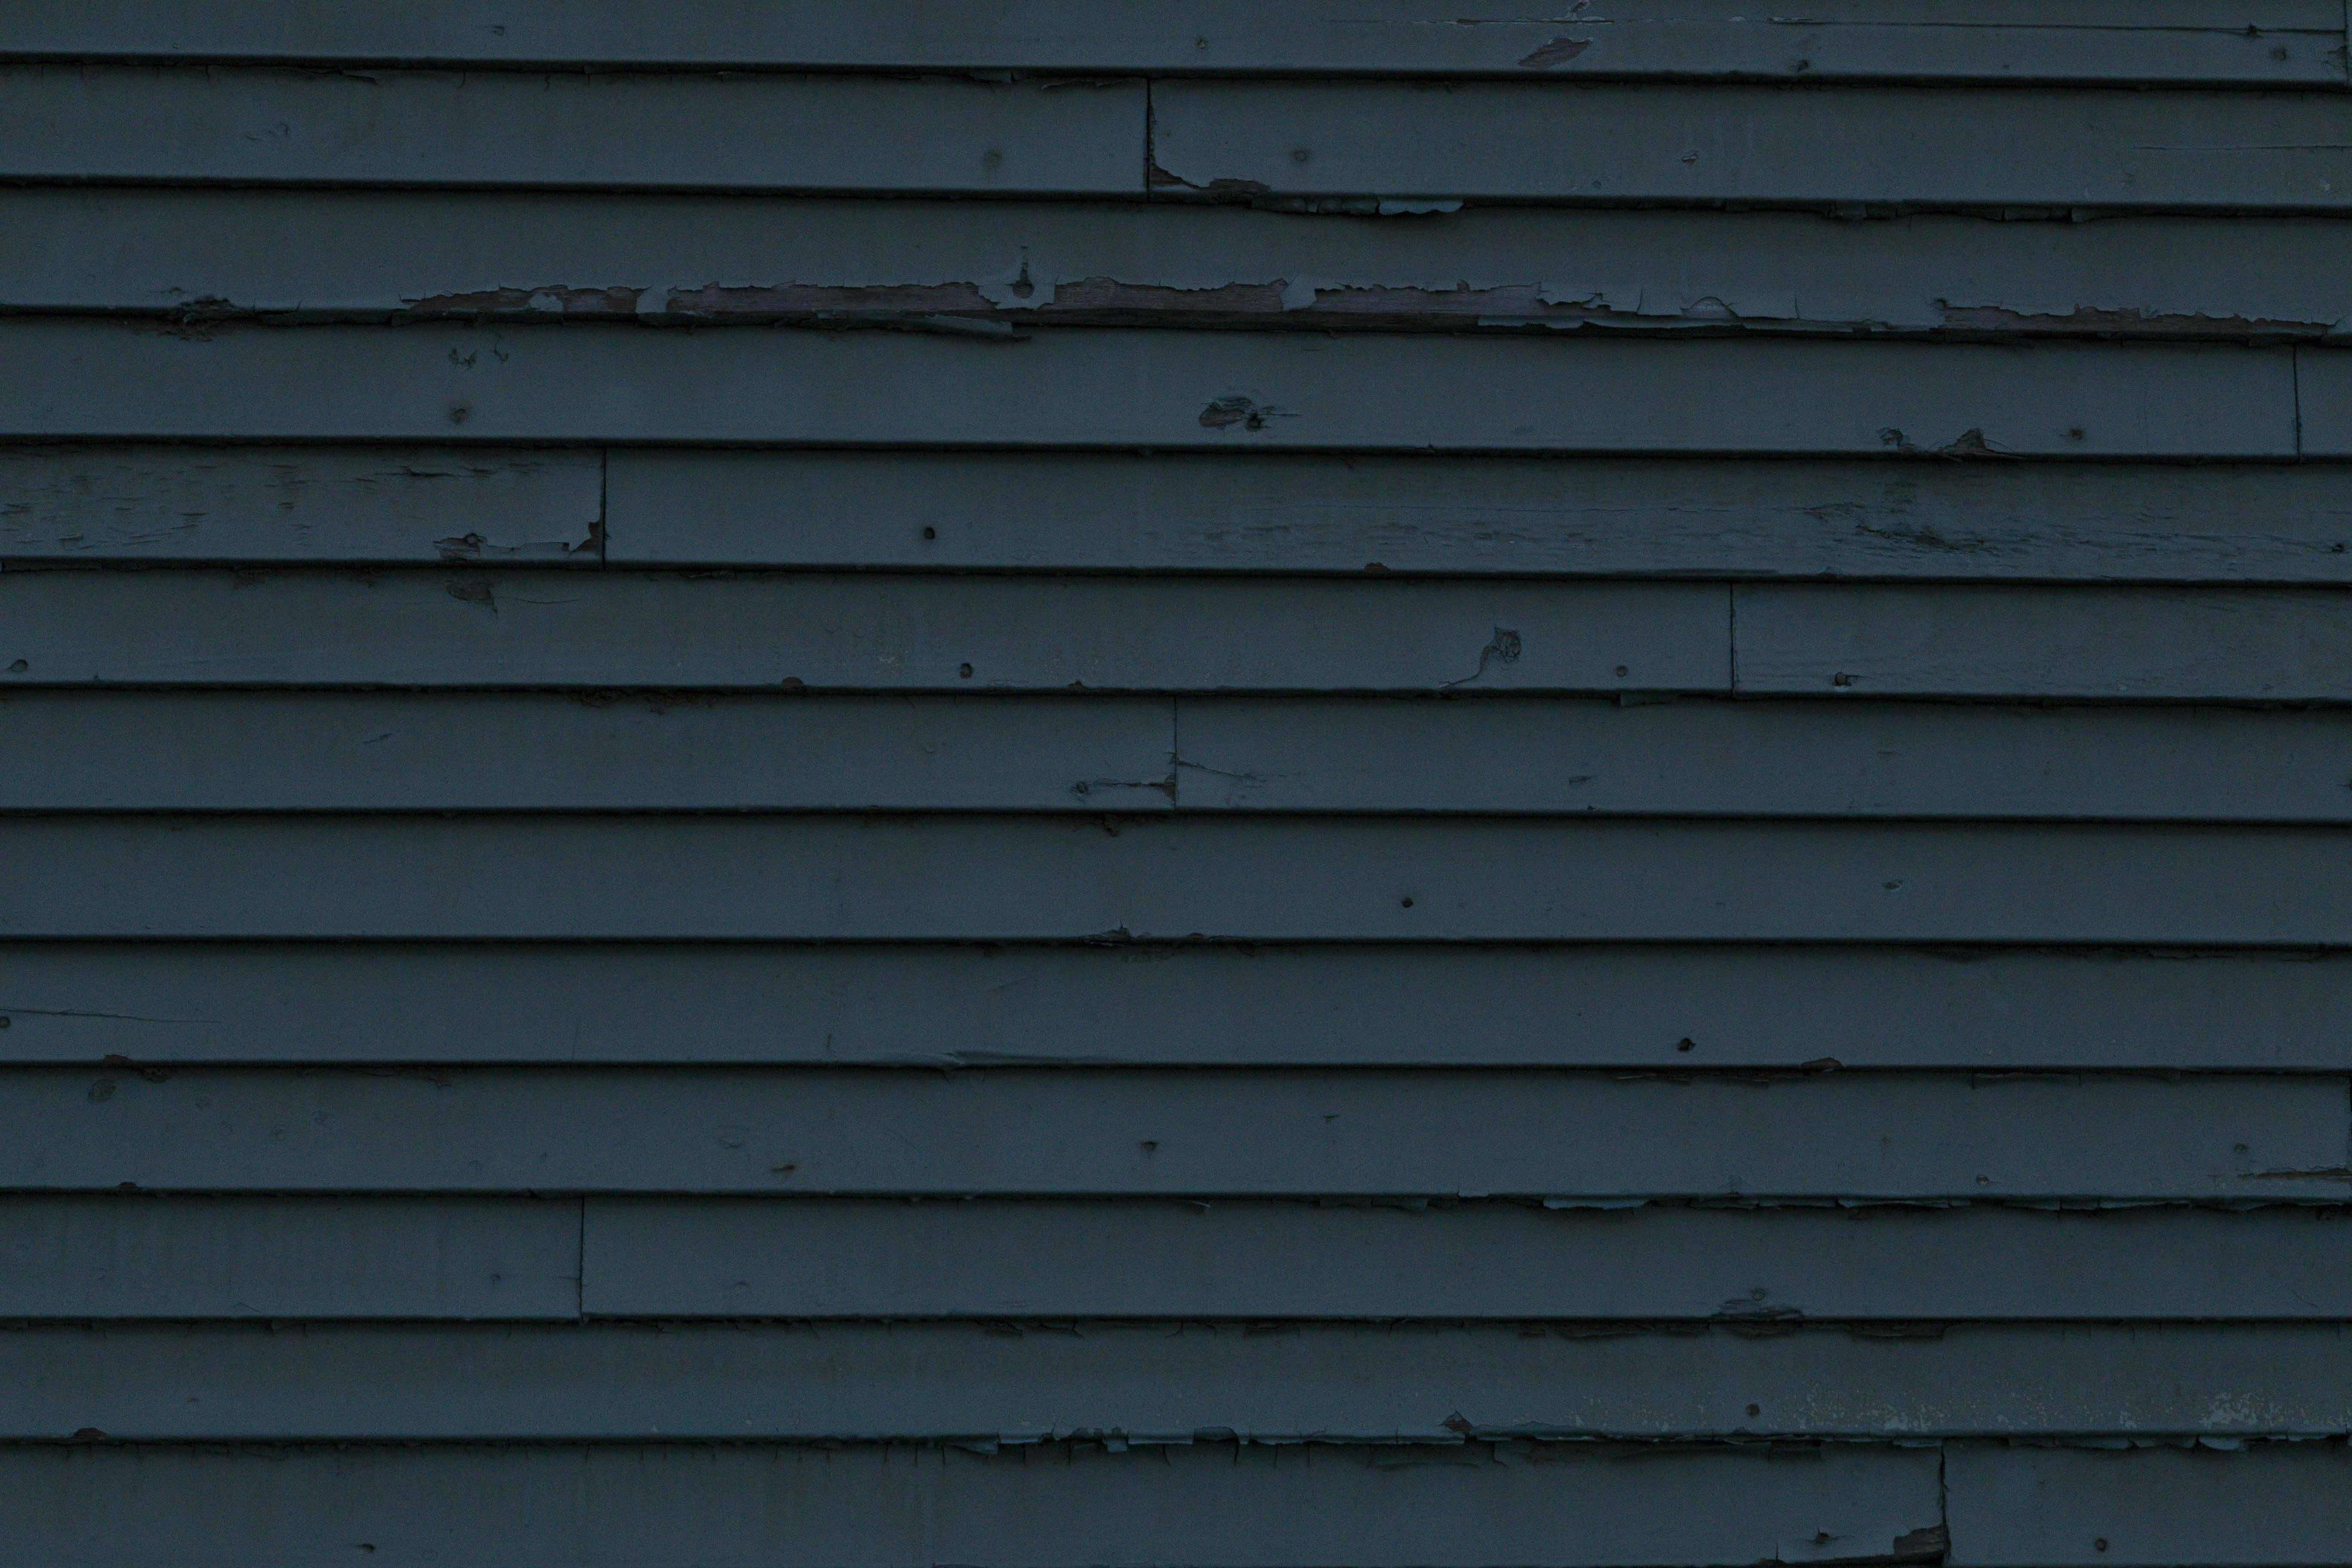 Gambar Gandum Tekstur Papan Atap Dinding Pola